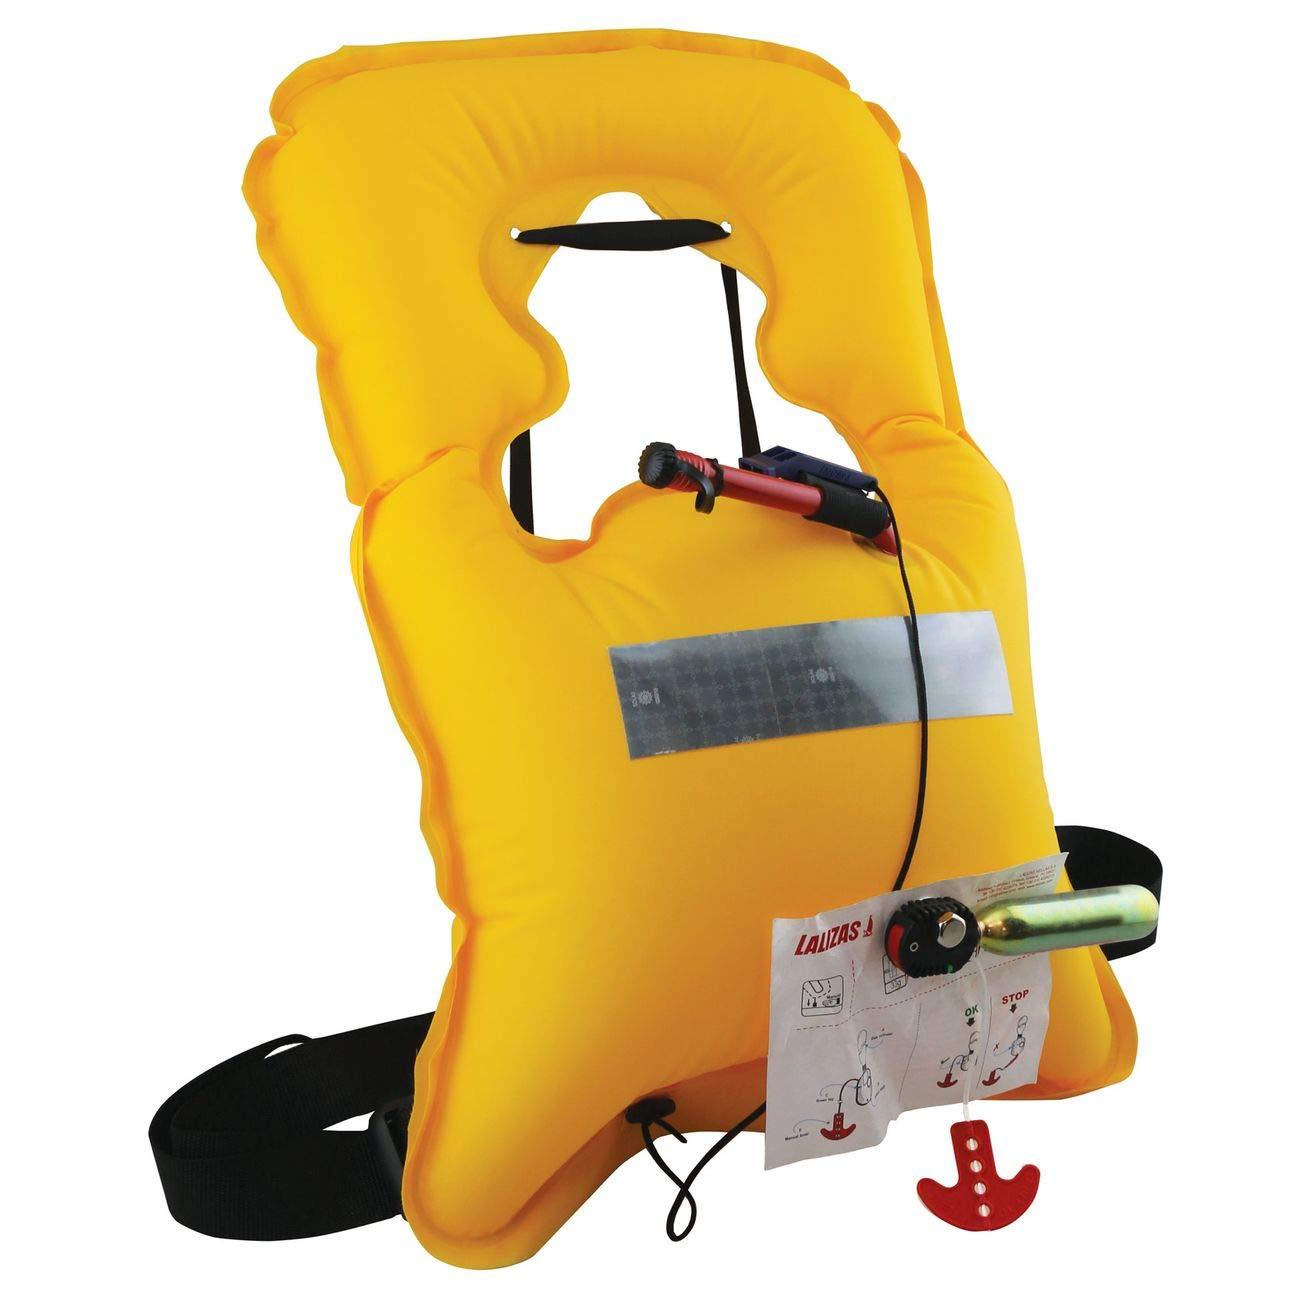 Chaleco salvavidas hinchable, Manual auslösung, ISO 12402 - 4 ...